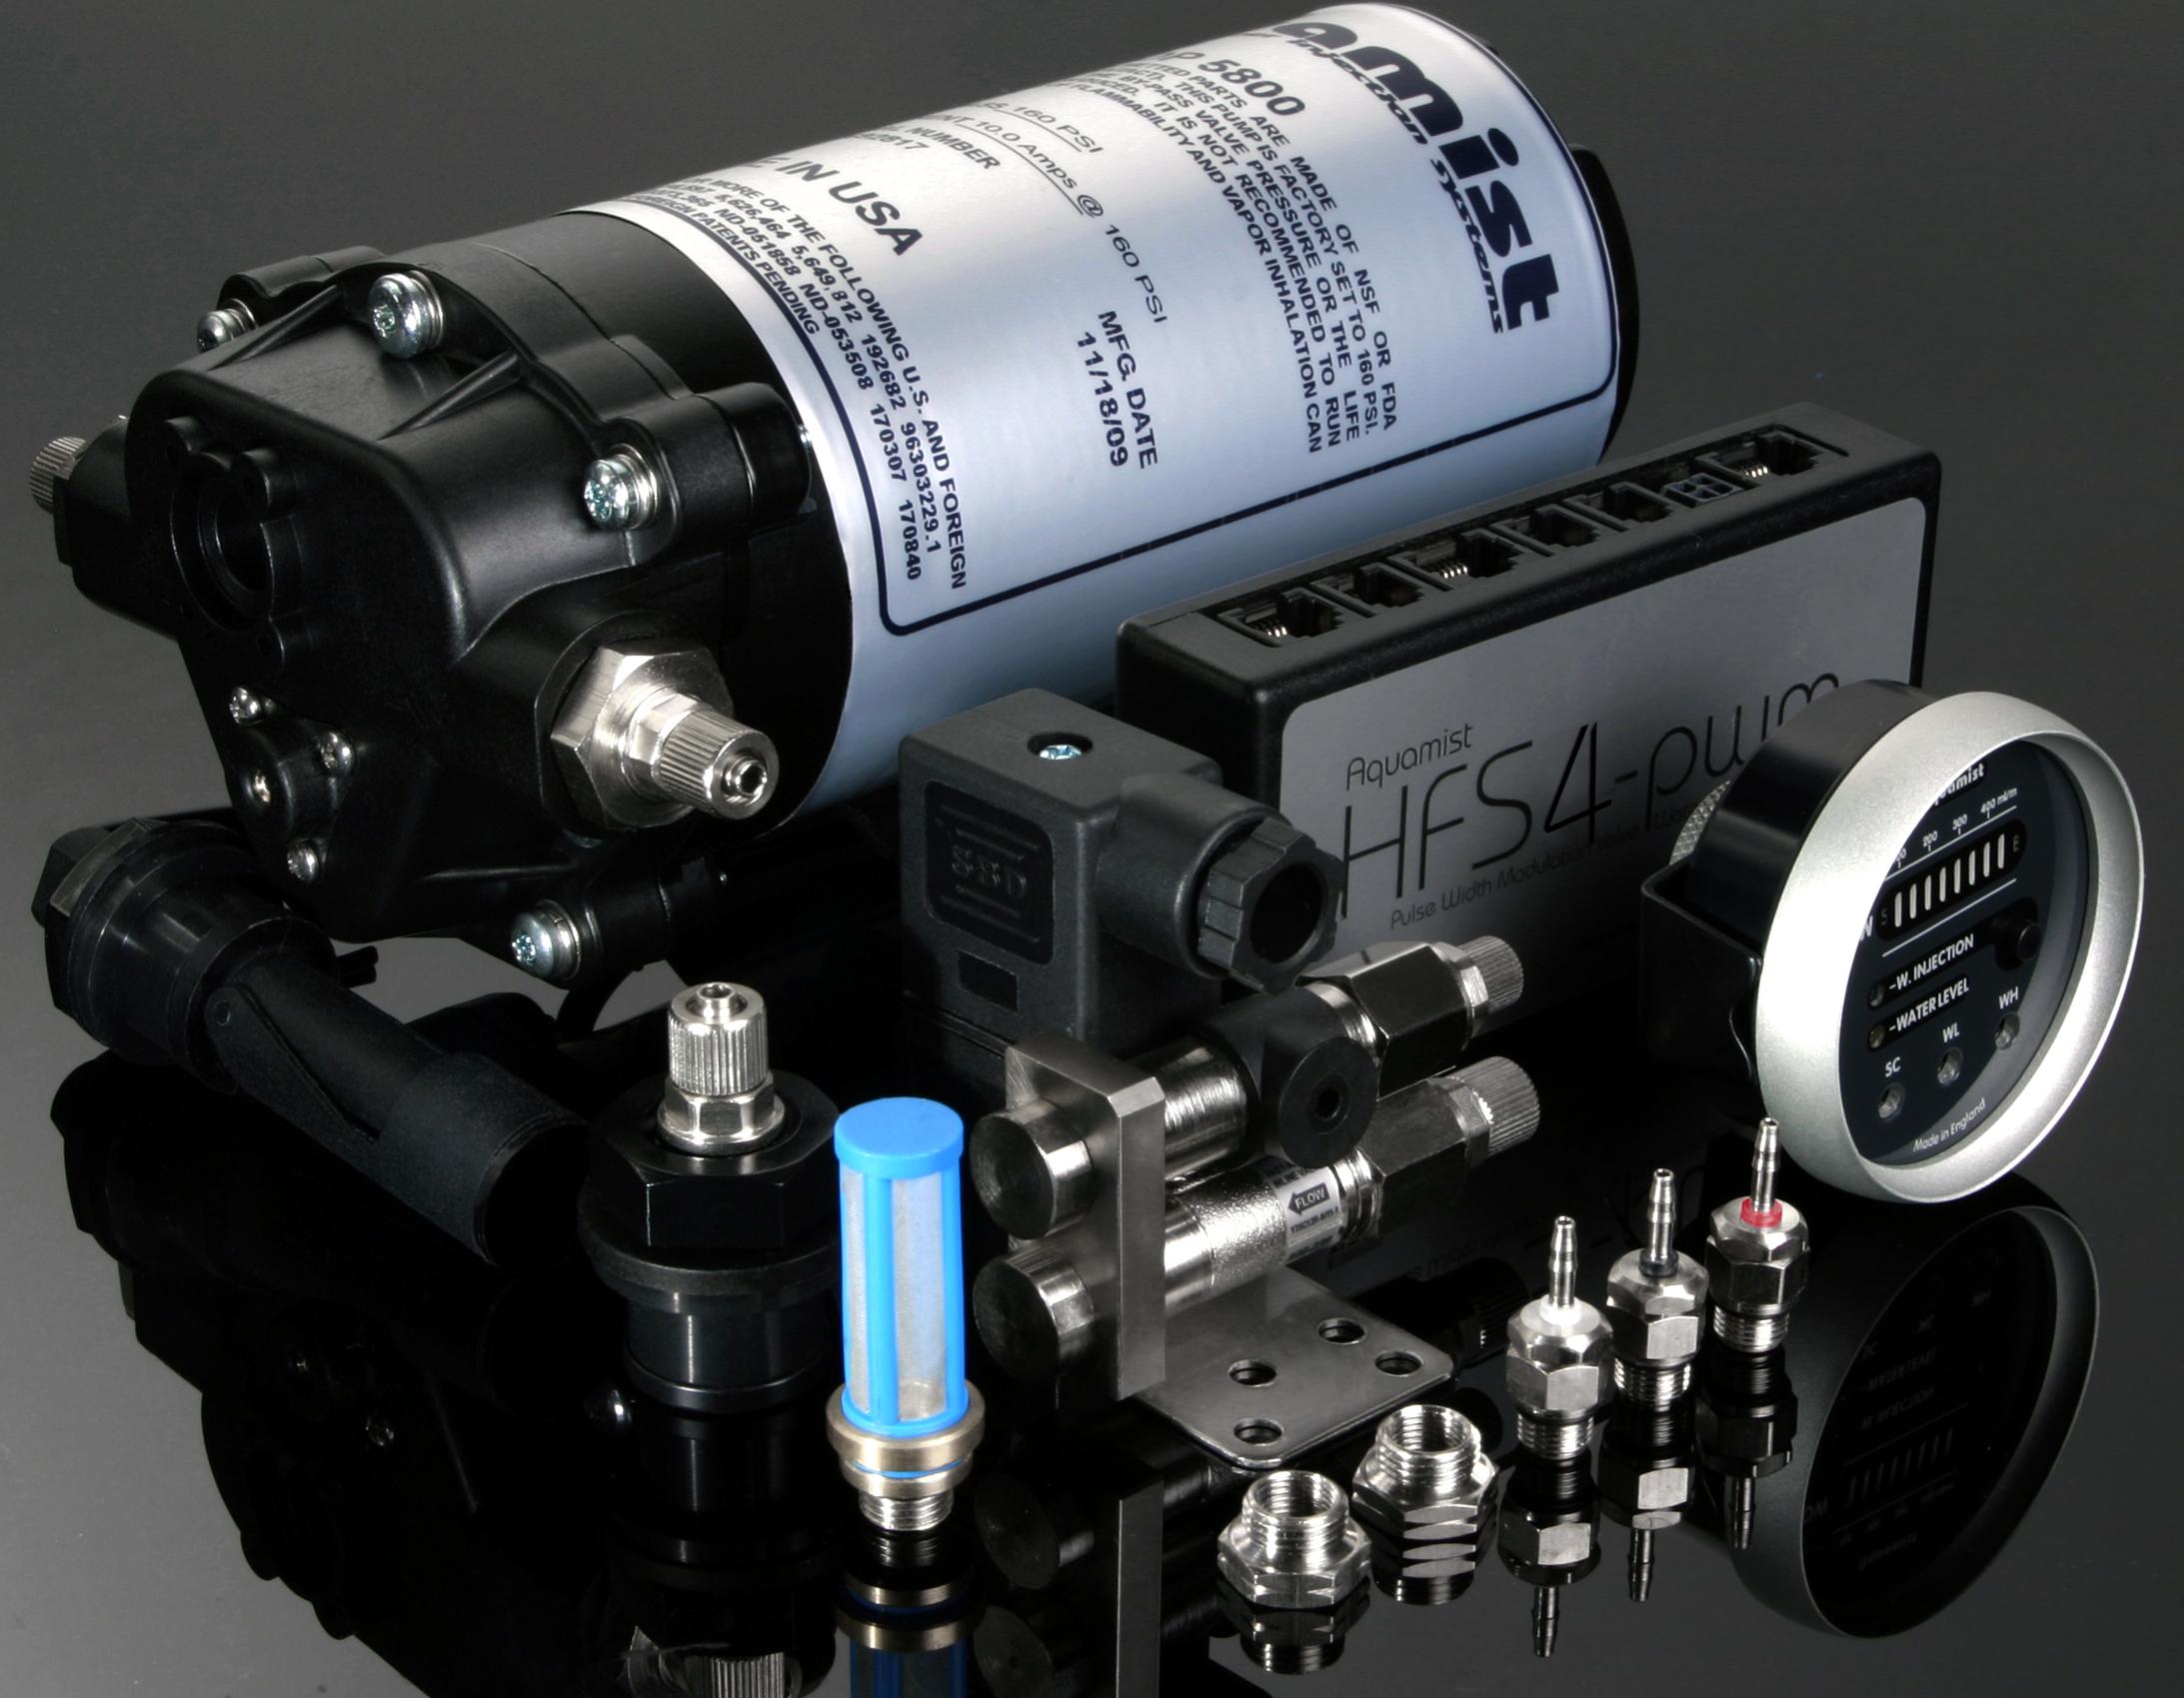 Aquamist Hfs4 Methanol Injection For Bmw Direct Engines S55 Engine Diagram Hfs 4 W M Assem